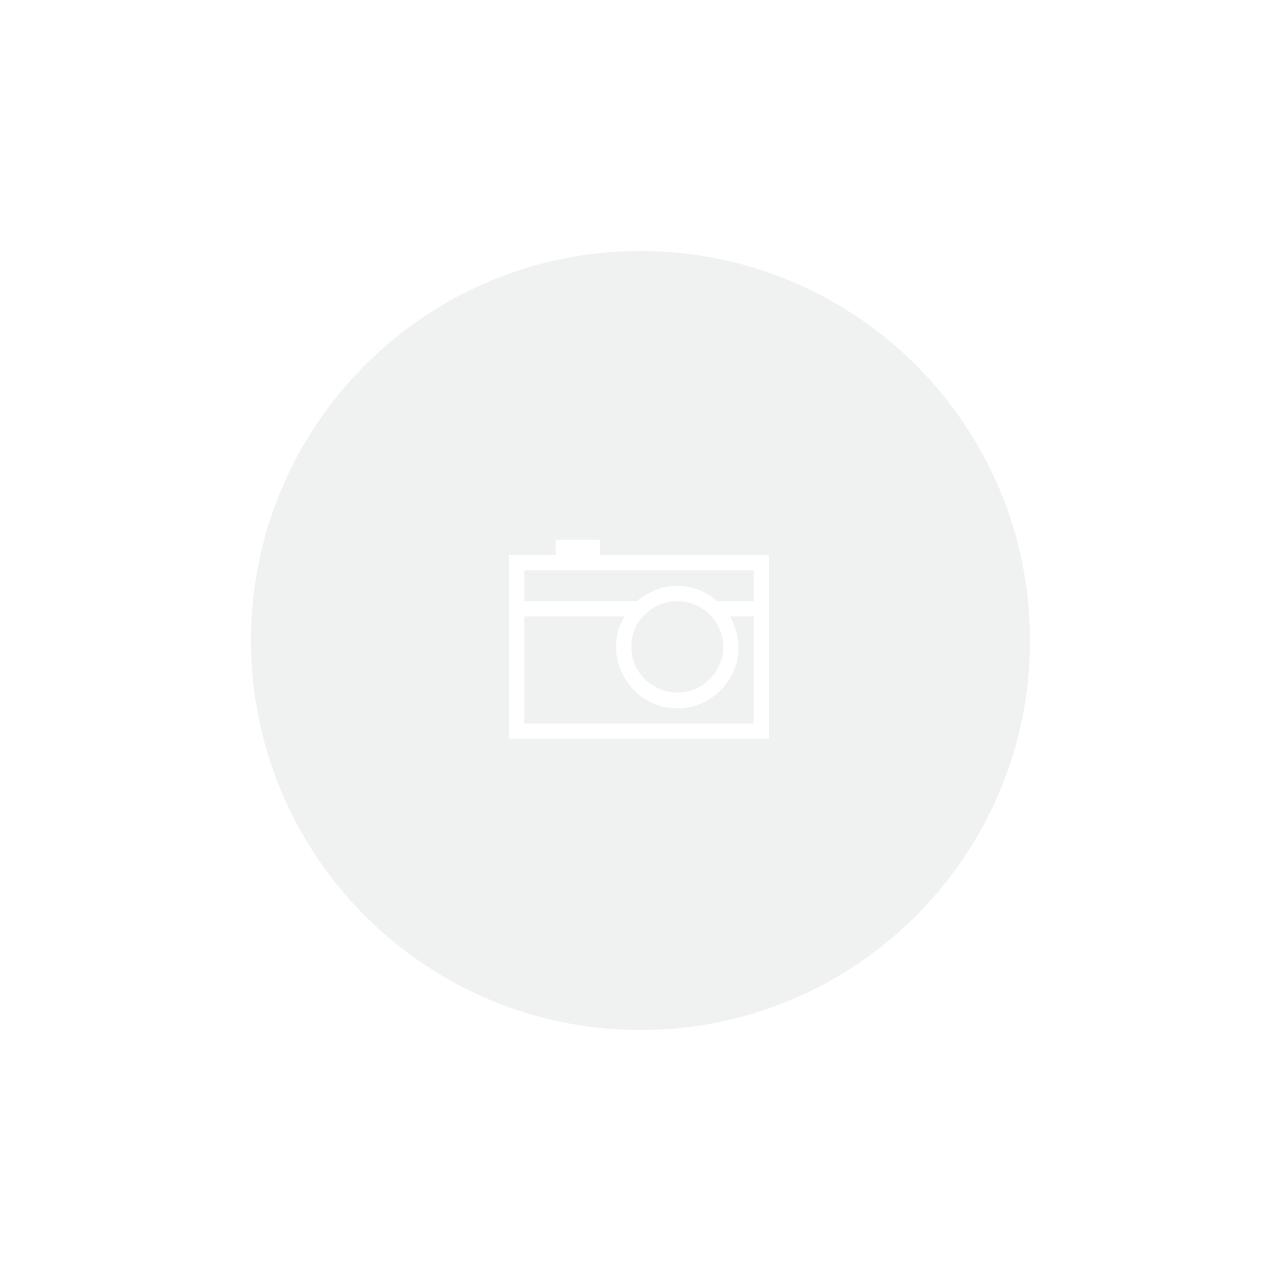 Stickers - Ref. 951D